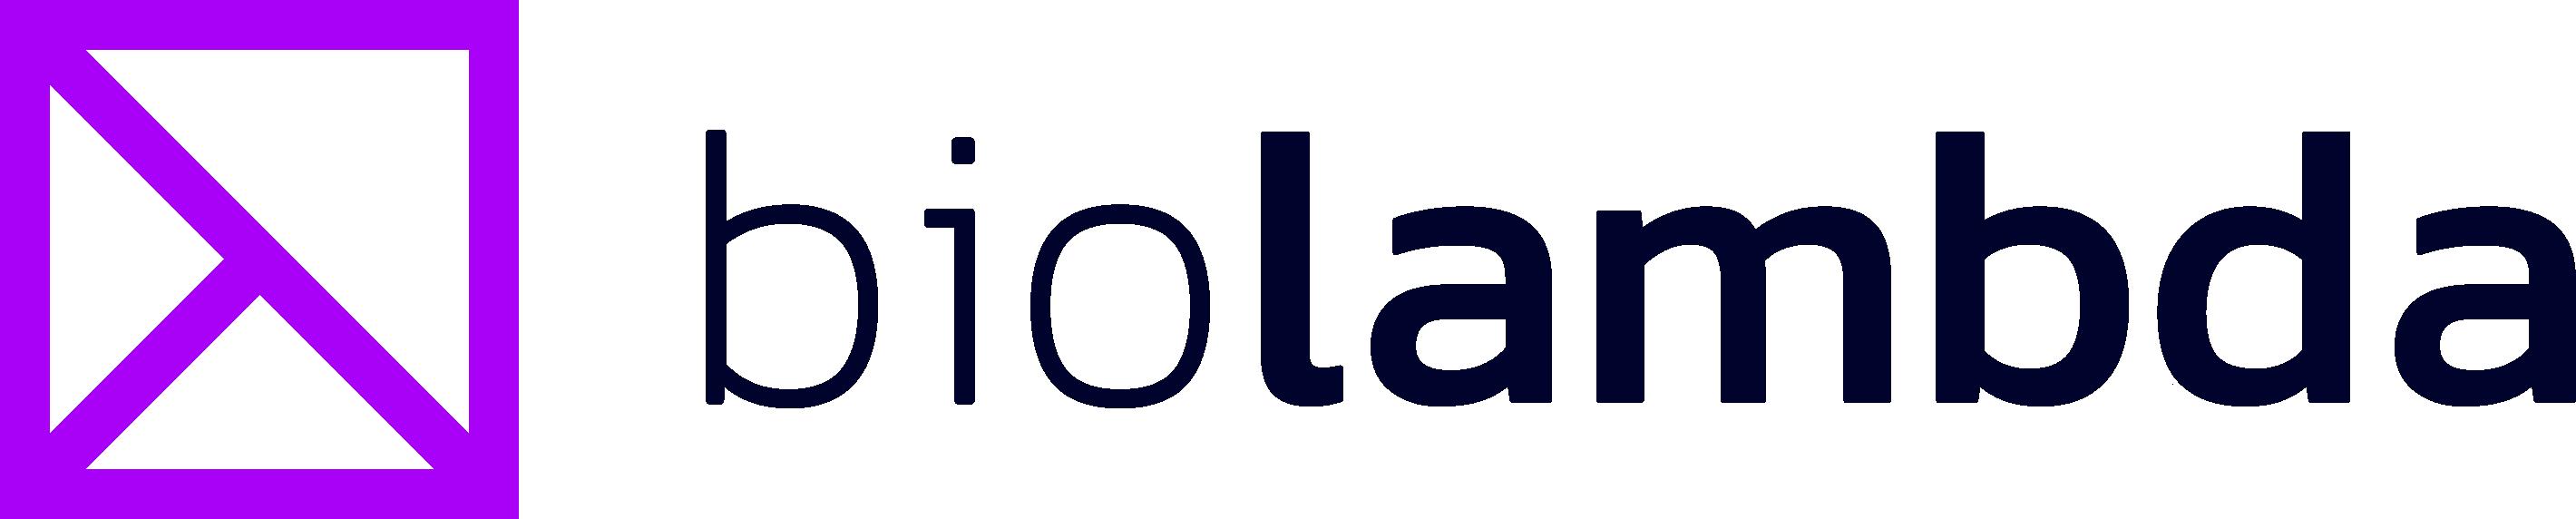 Assinatura Biolambda.